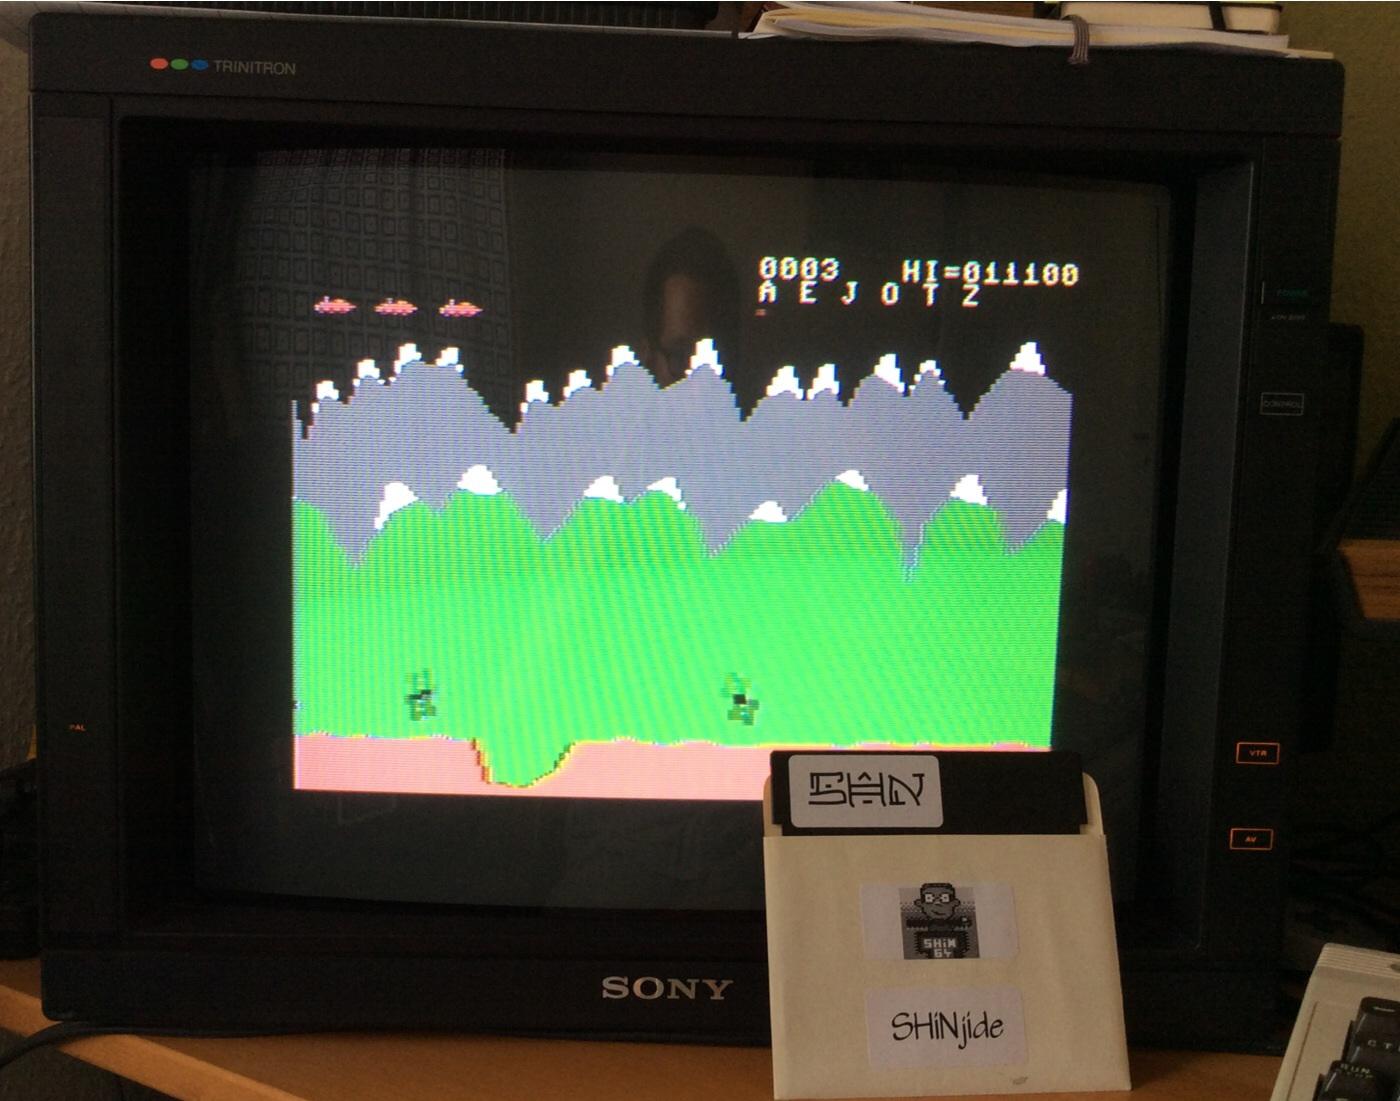 SHiNjide: Moon Patrol (Commodore 64) 11,100 points on 2014-07-14 12:06:05